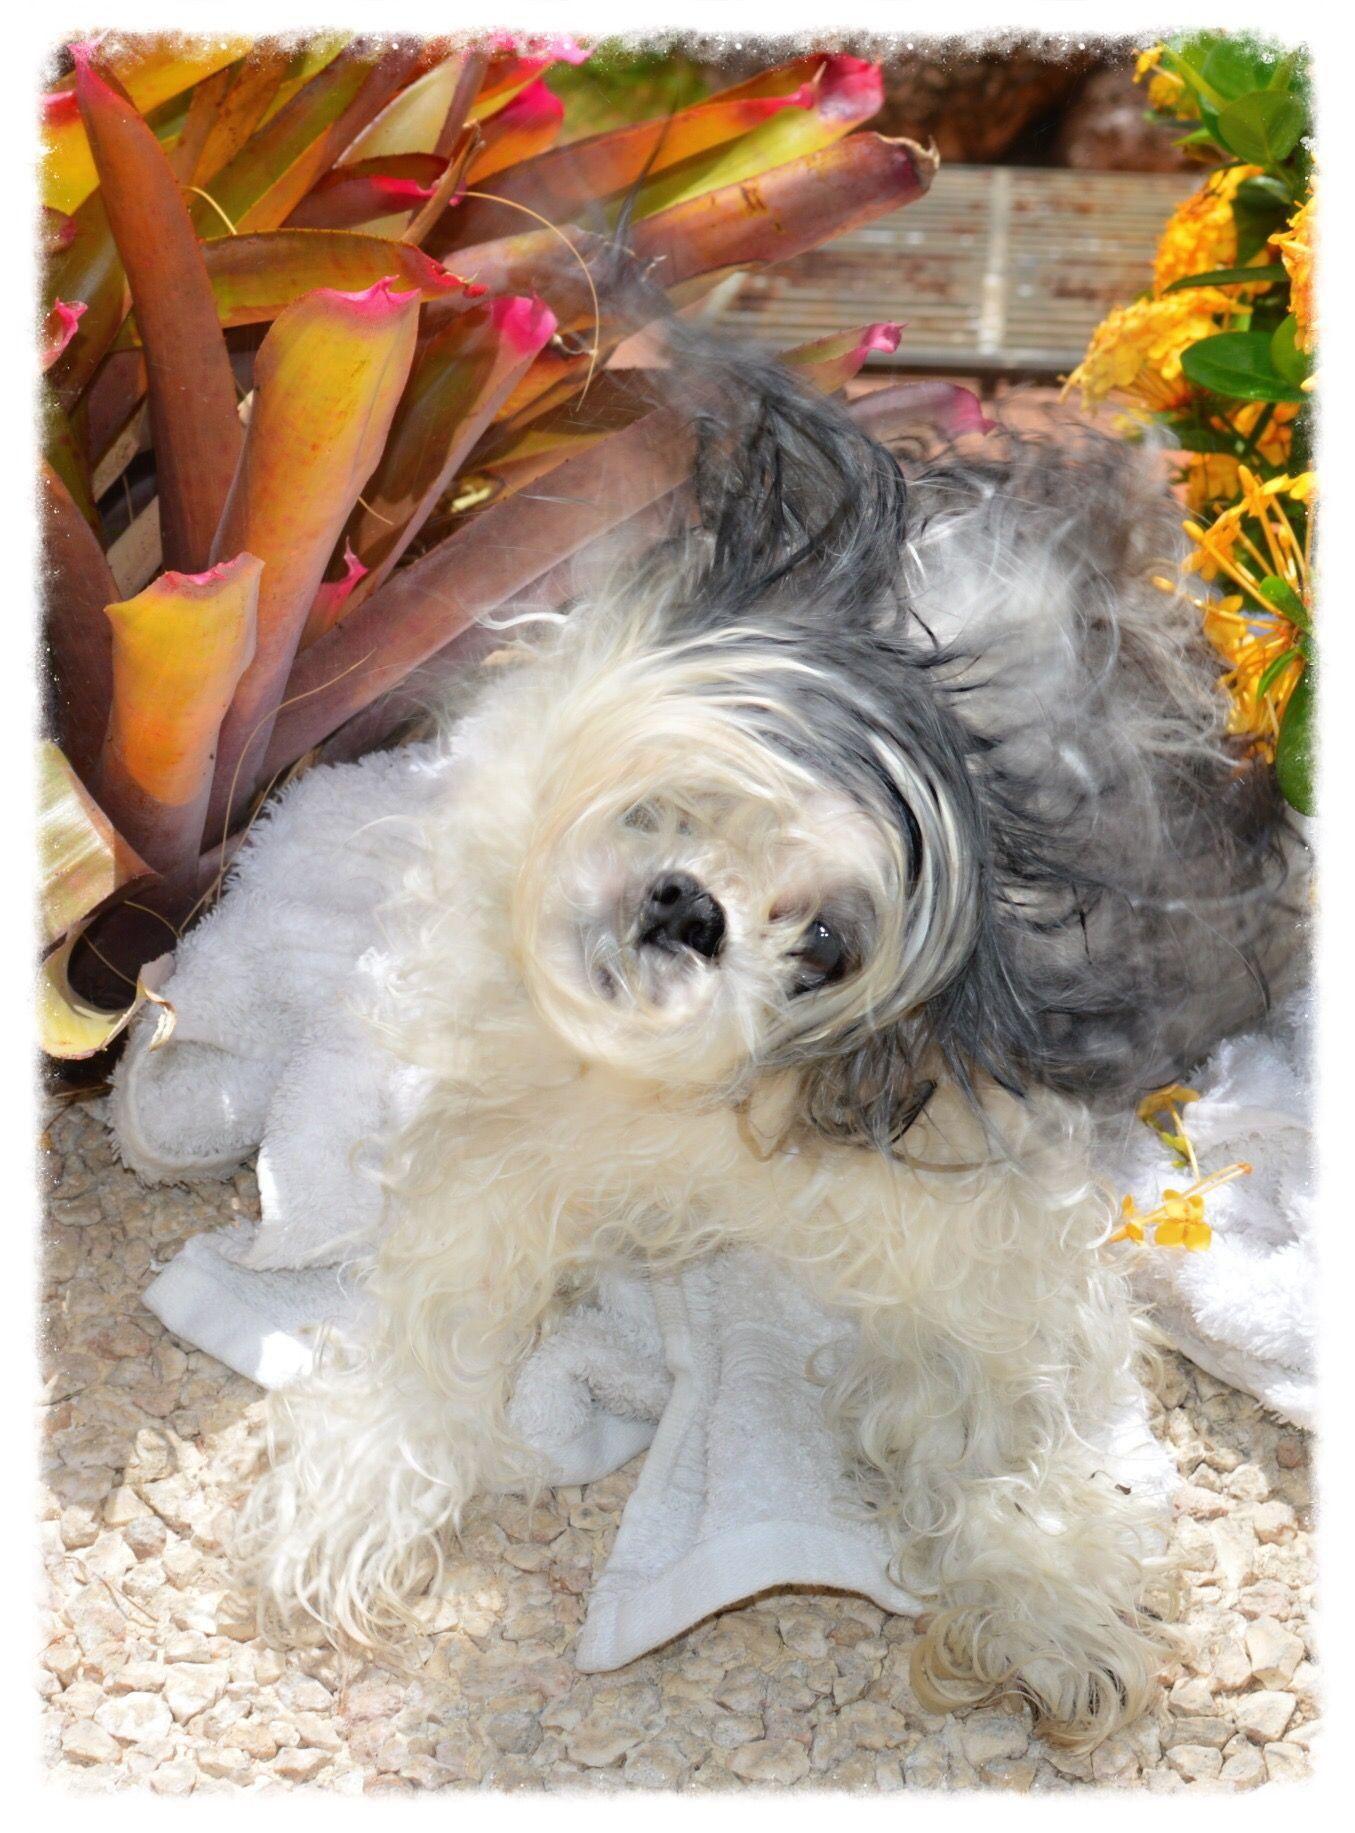 June 29 2015 Motita Shaking Her Head After A Bath Pet Loss